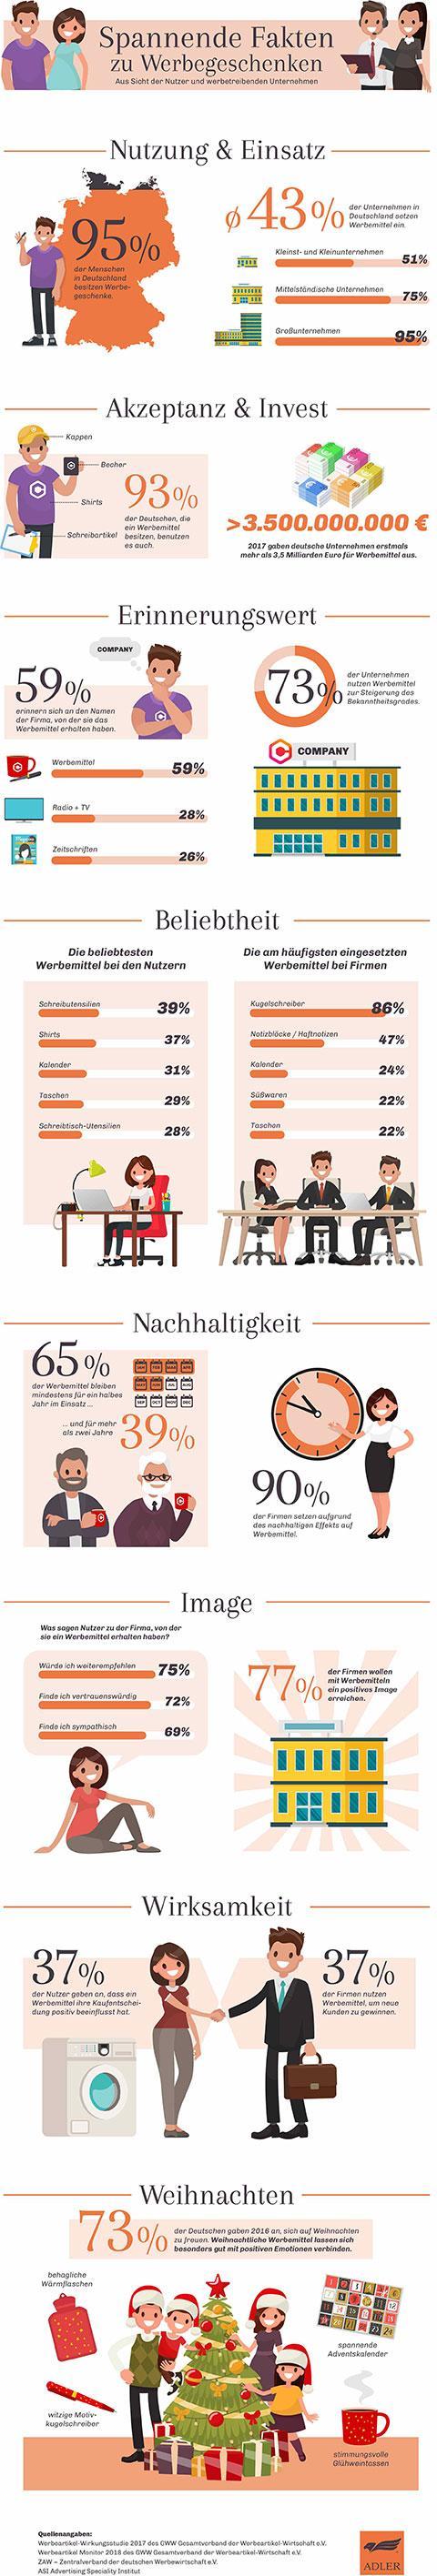 Werbeartikel - Infografik